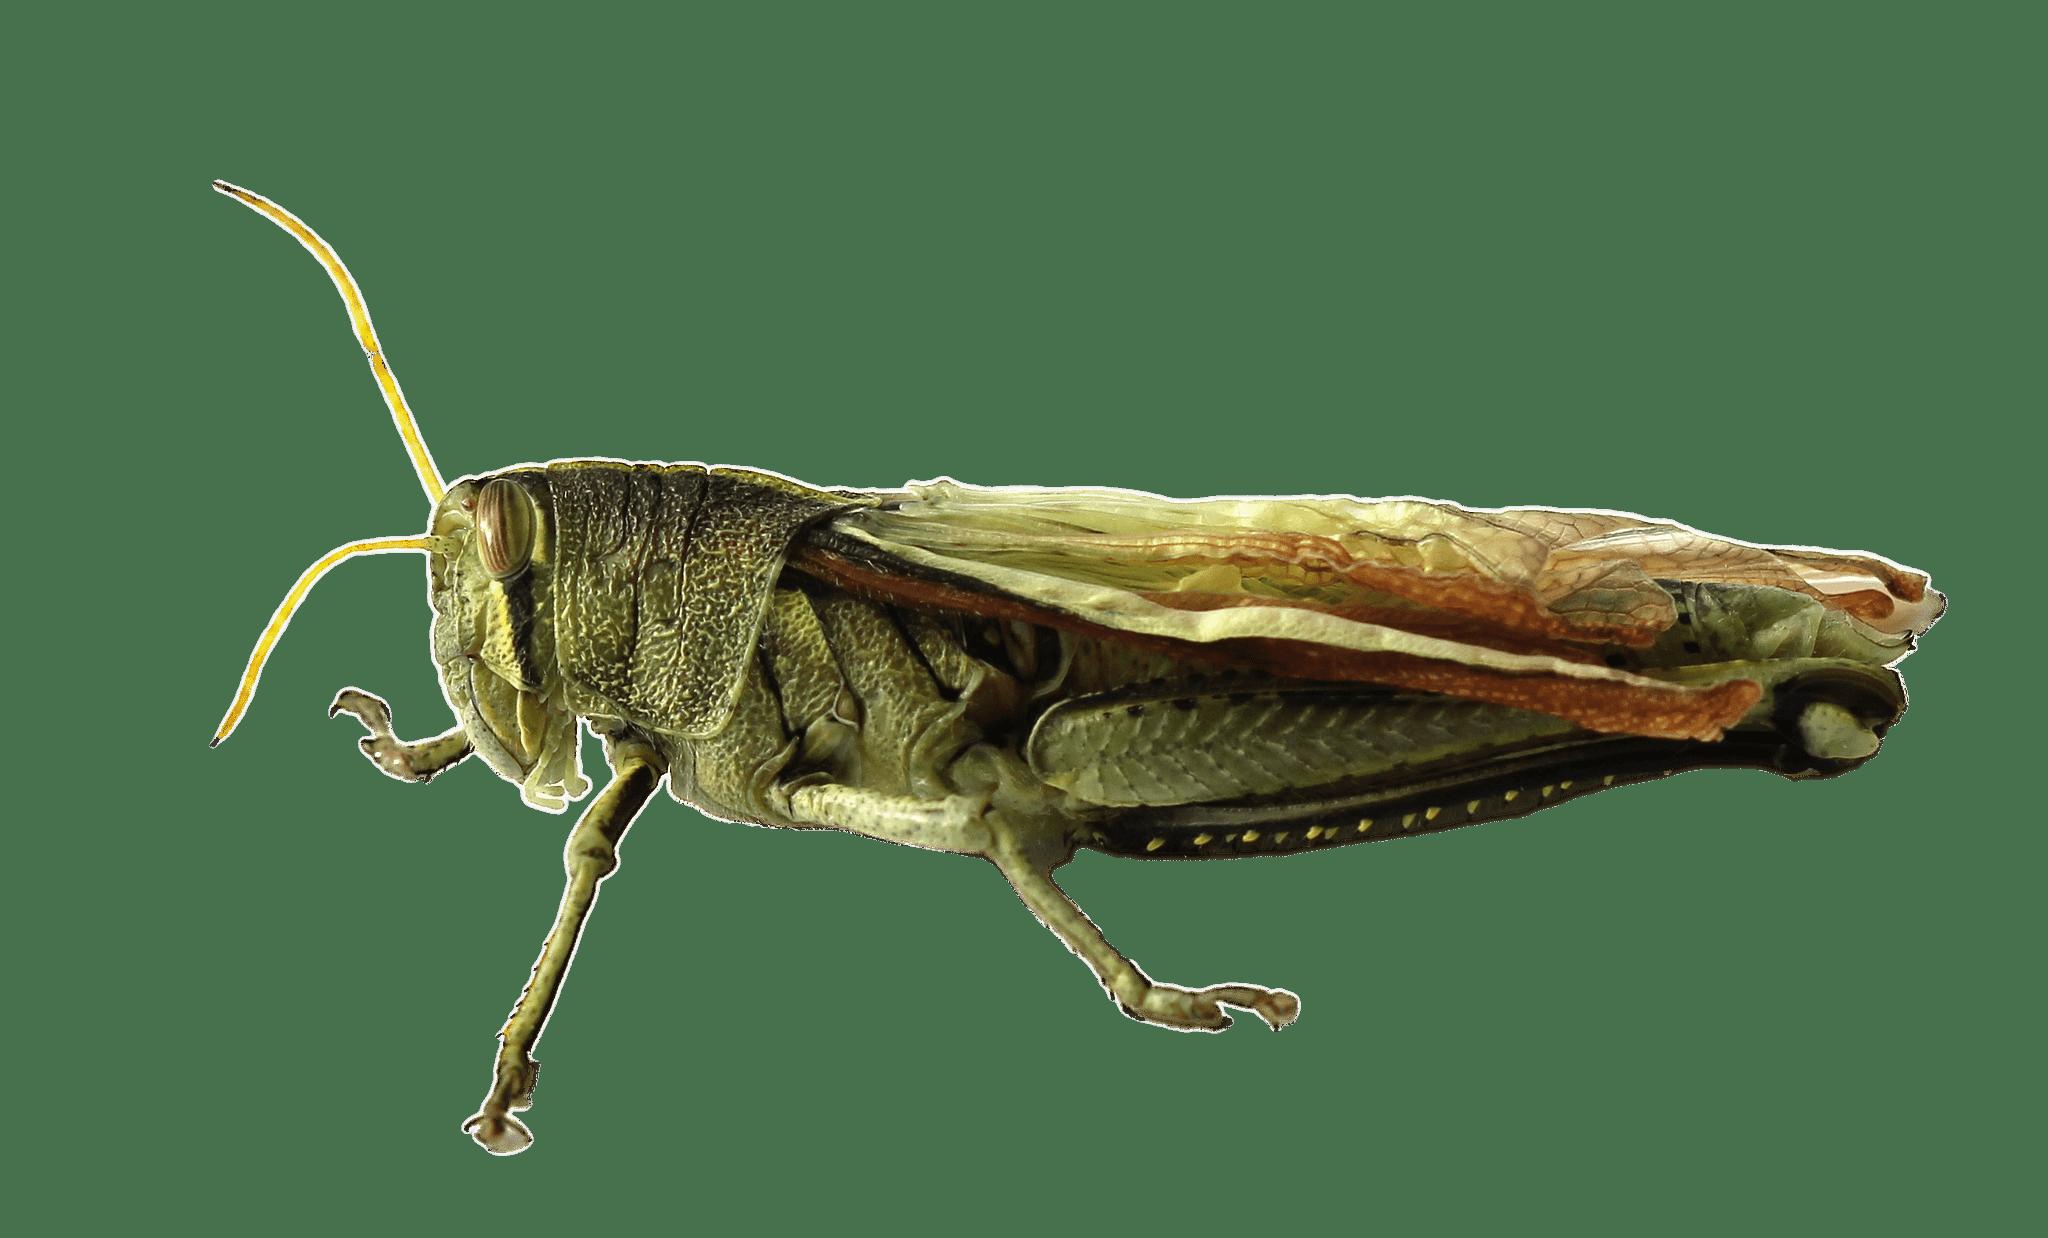 jpg library download Grasshopper clipart invertebrate. Transparent png stickpng